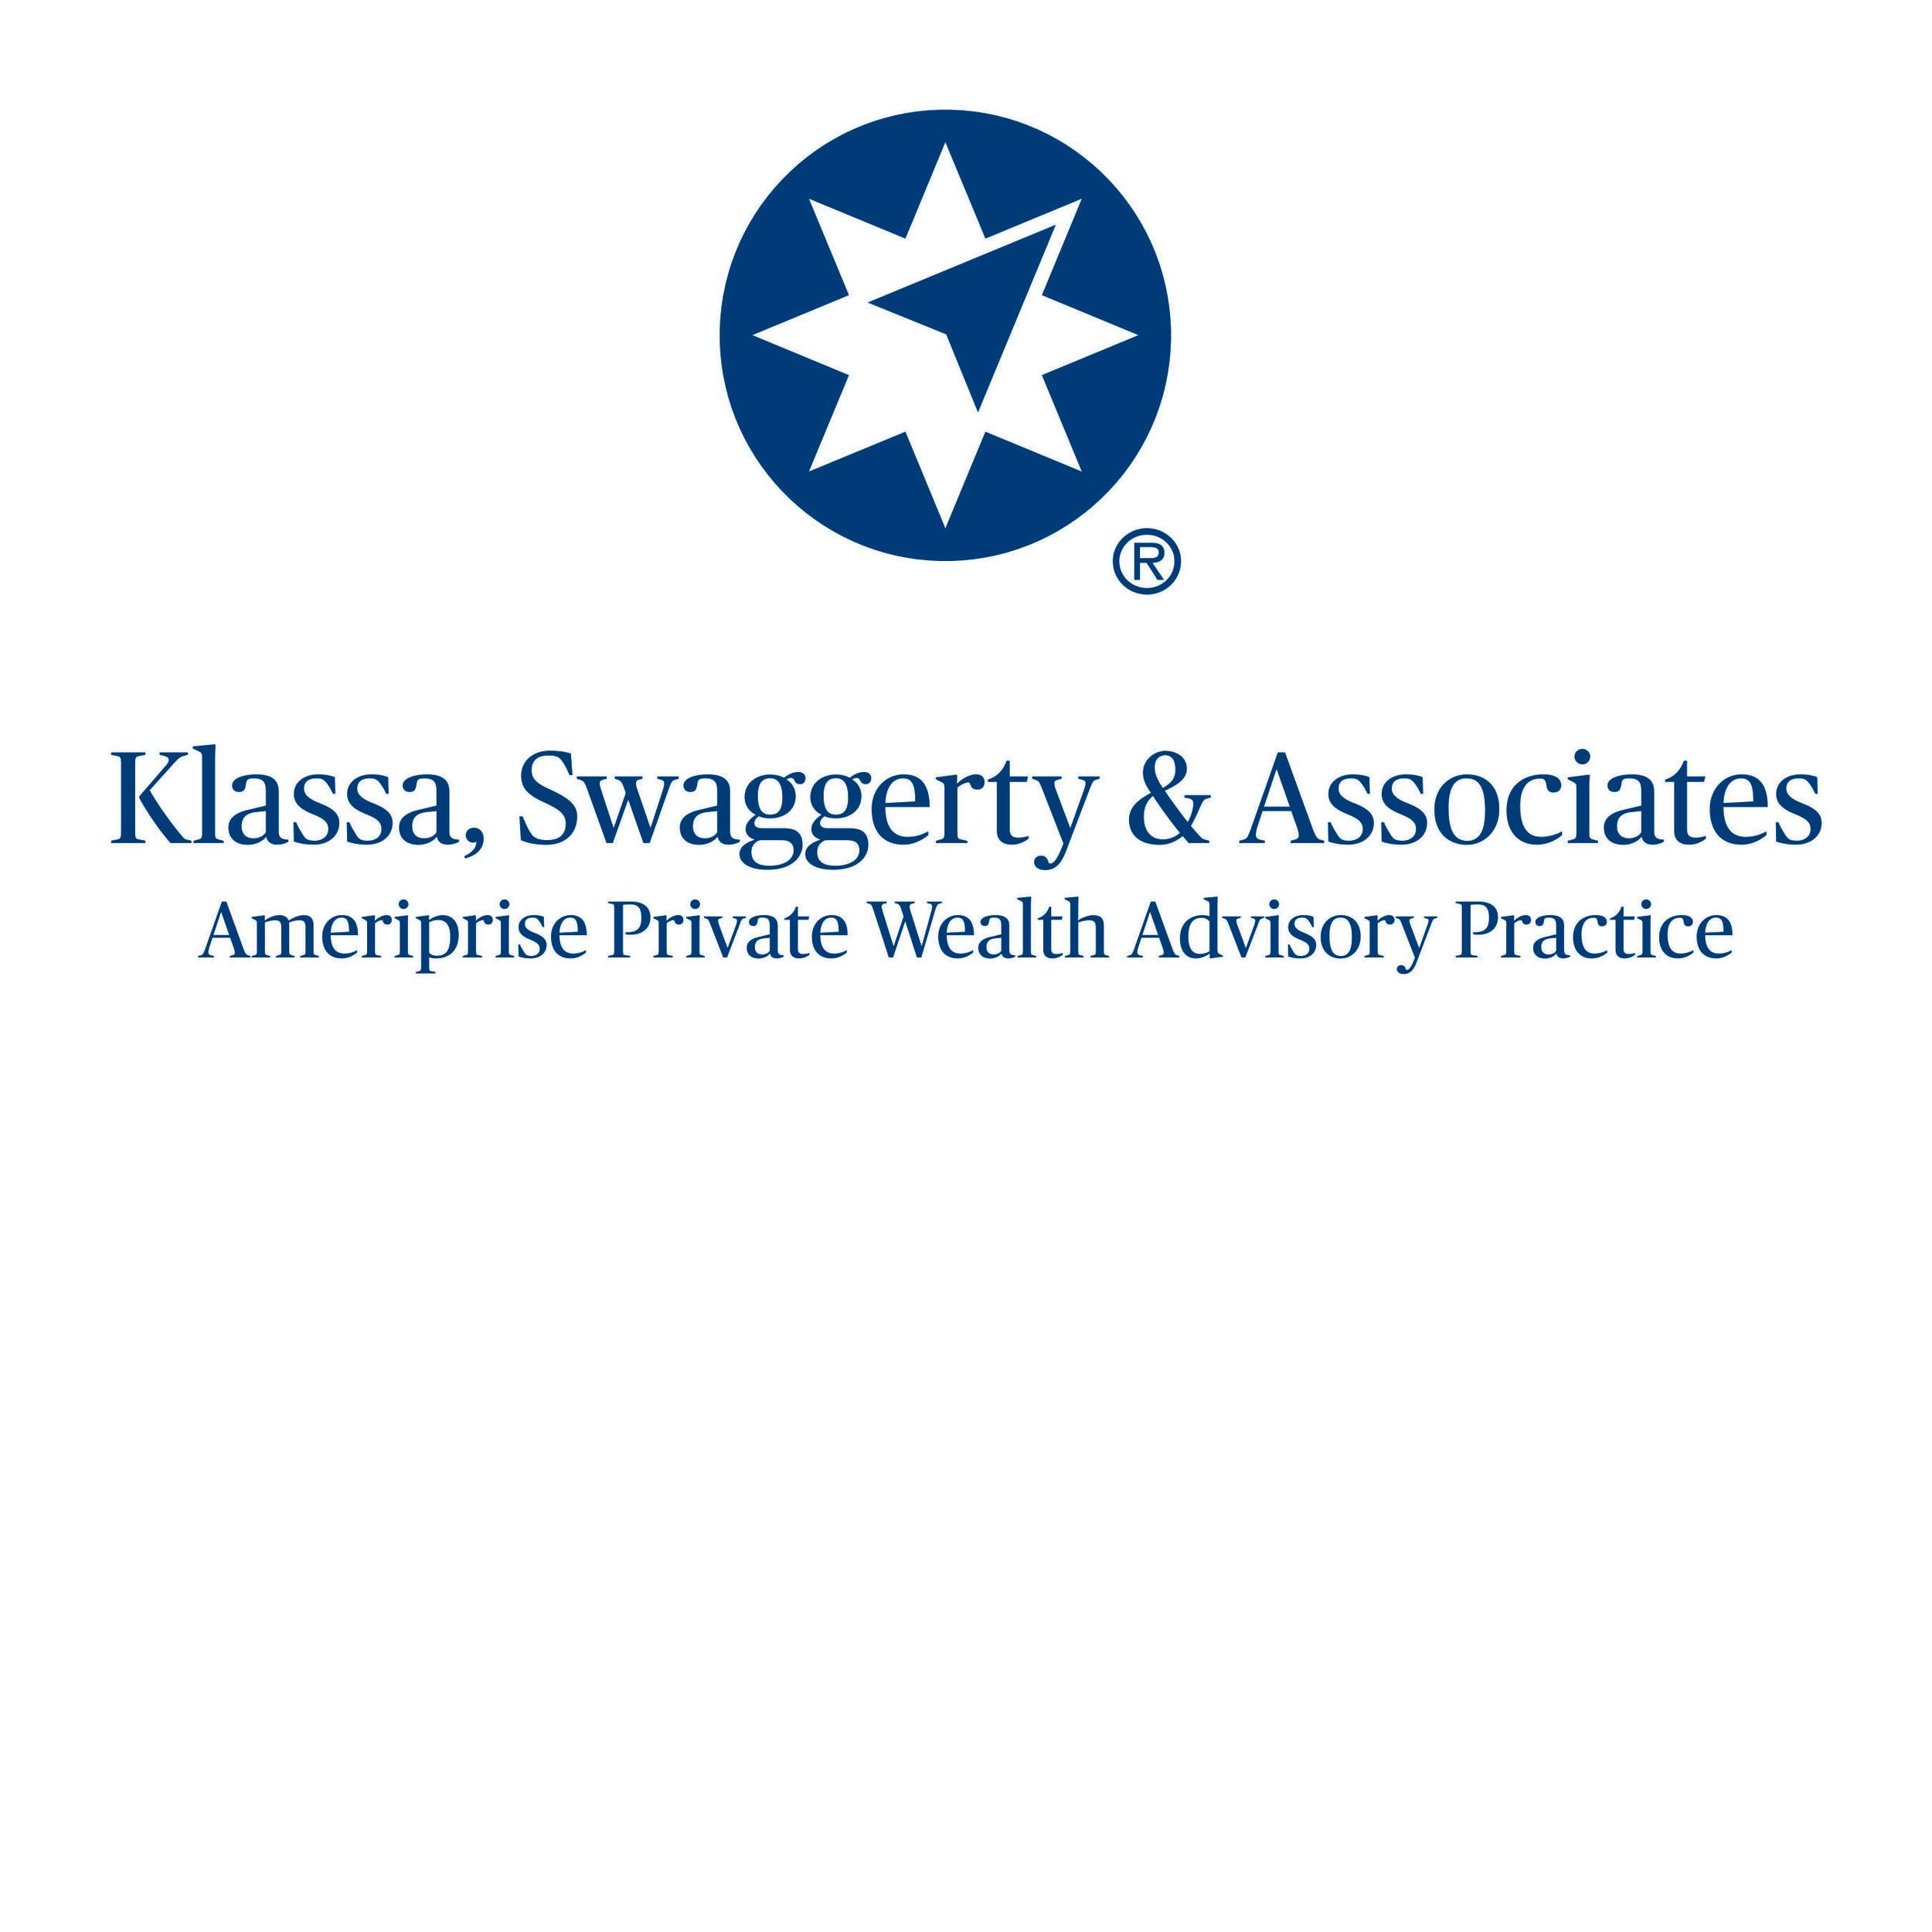 PWA_Klassa, Swaggerty & Associates_Reg_B.jpeg